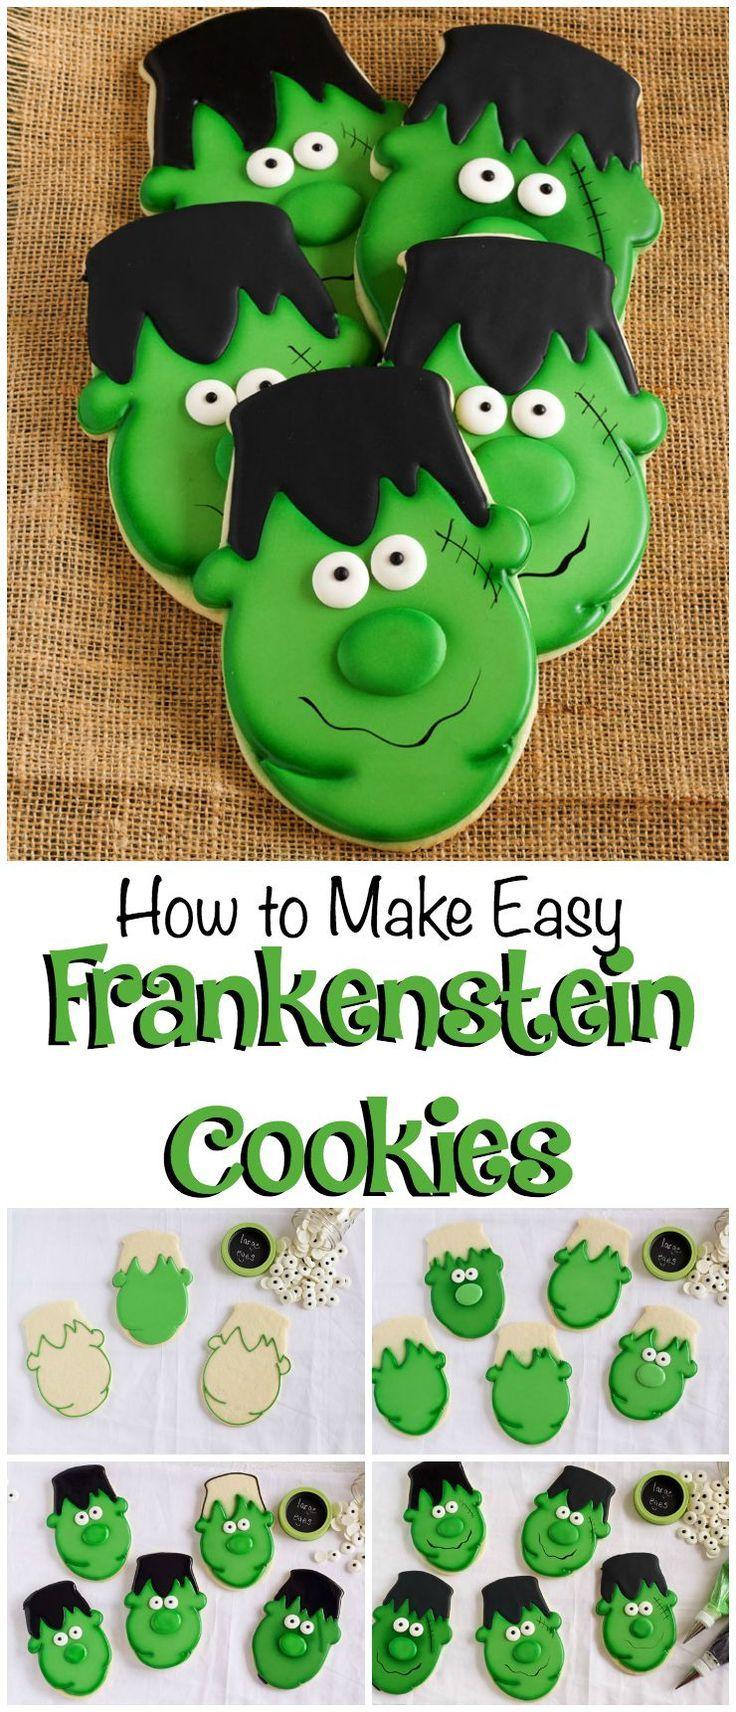 How to Make Easy Frankenstein Cookies via http://www.thebearfootbaker.com